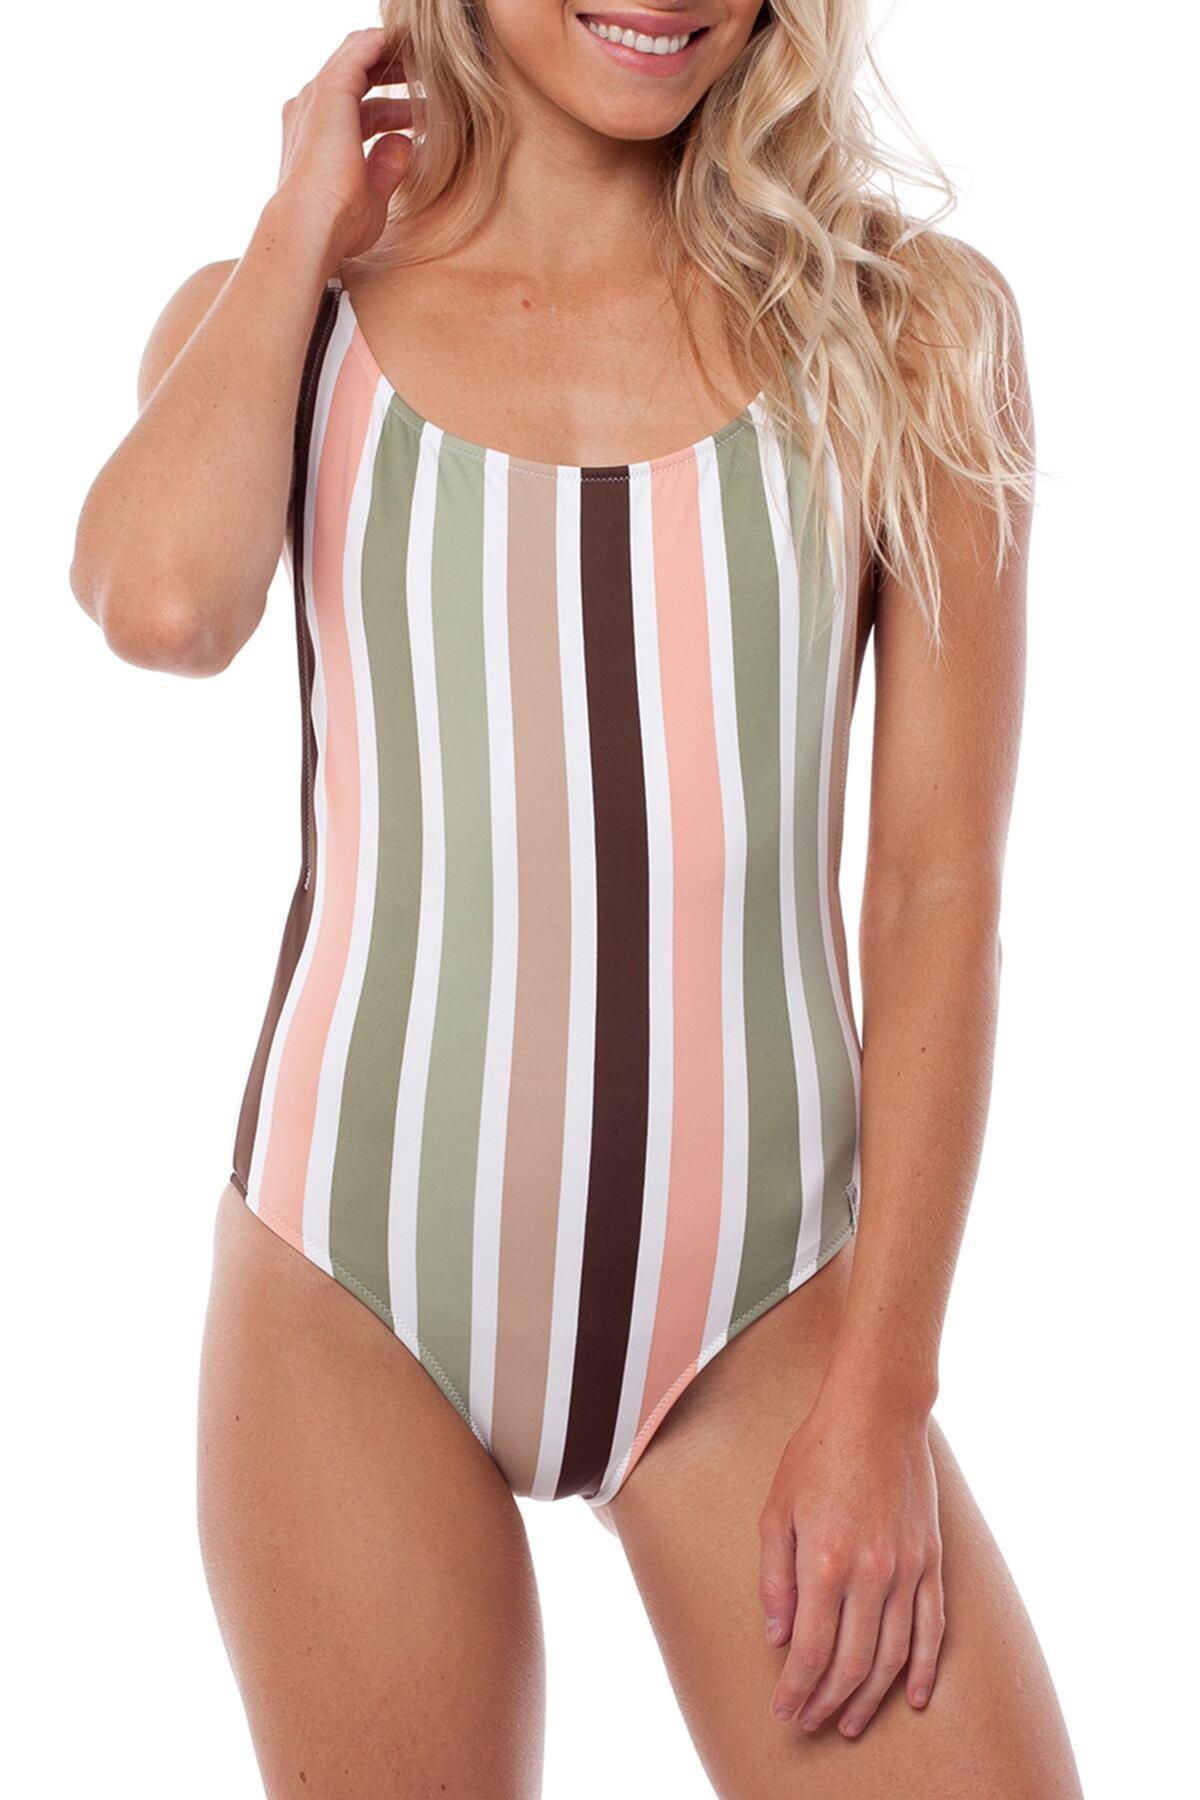 541b18bf7c466 Lyst - Rhythm Zimbabwe One-piece Swimsuit - Save 17%